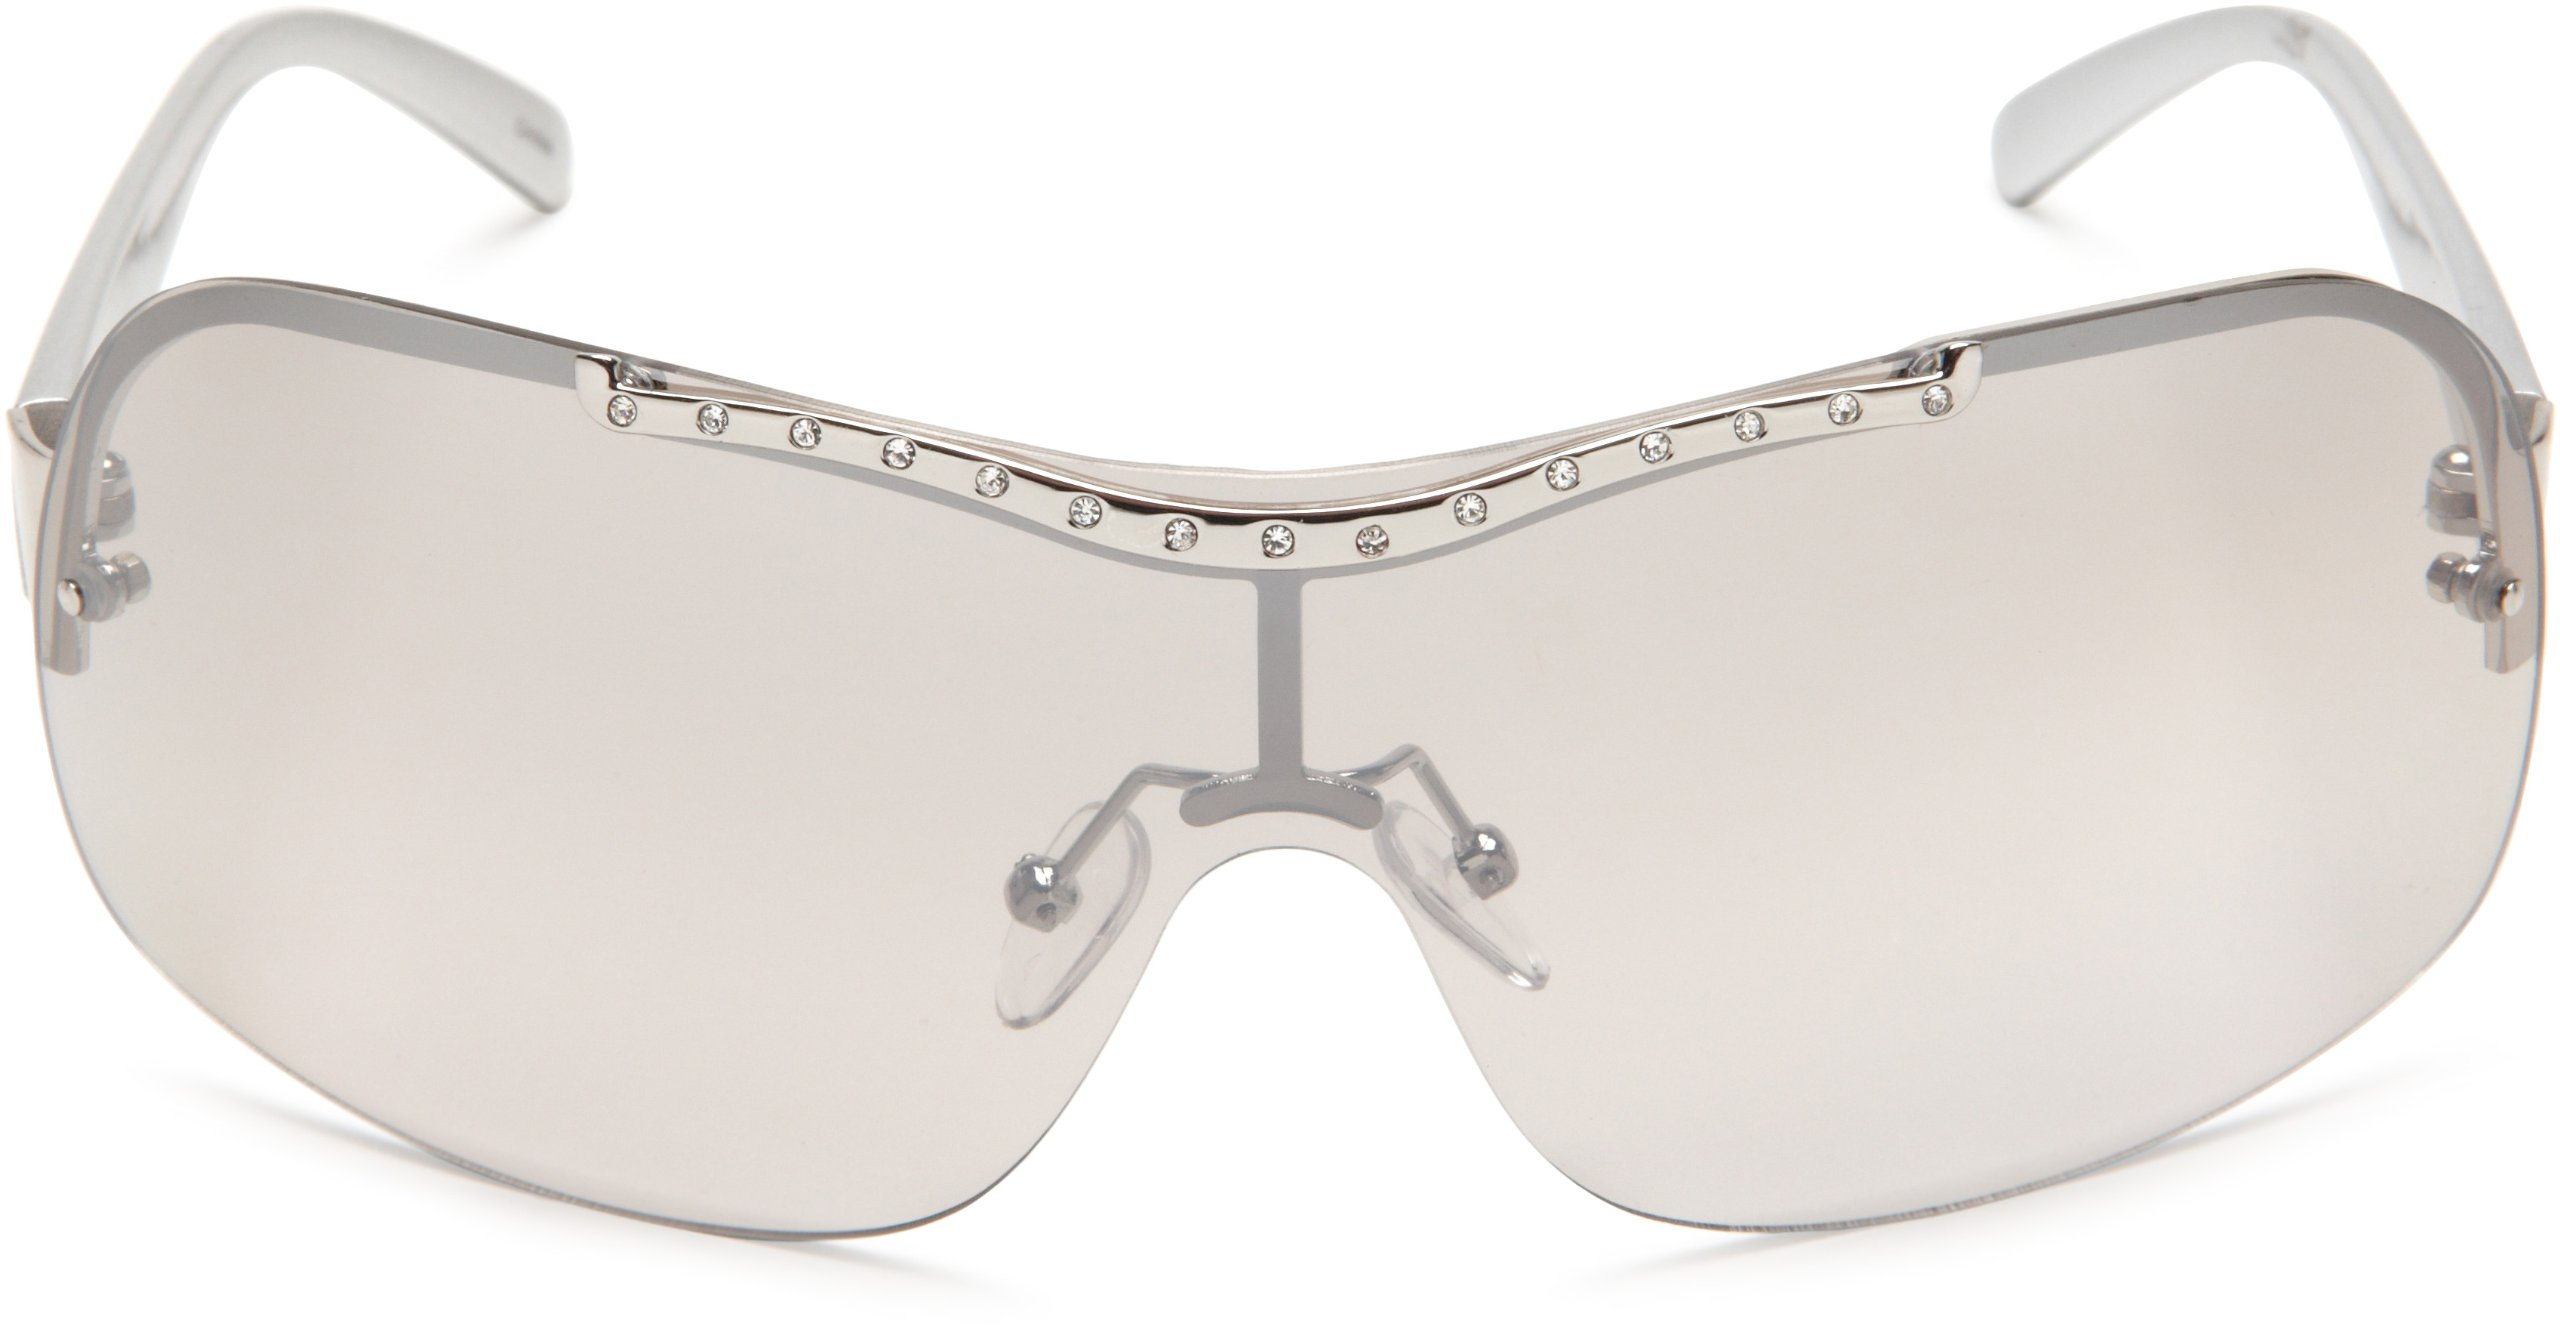 dbd154c85aa4 Amazon.com  SOUTHPOLE  Sunglasses